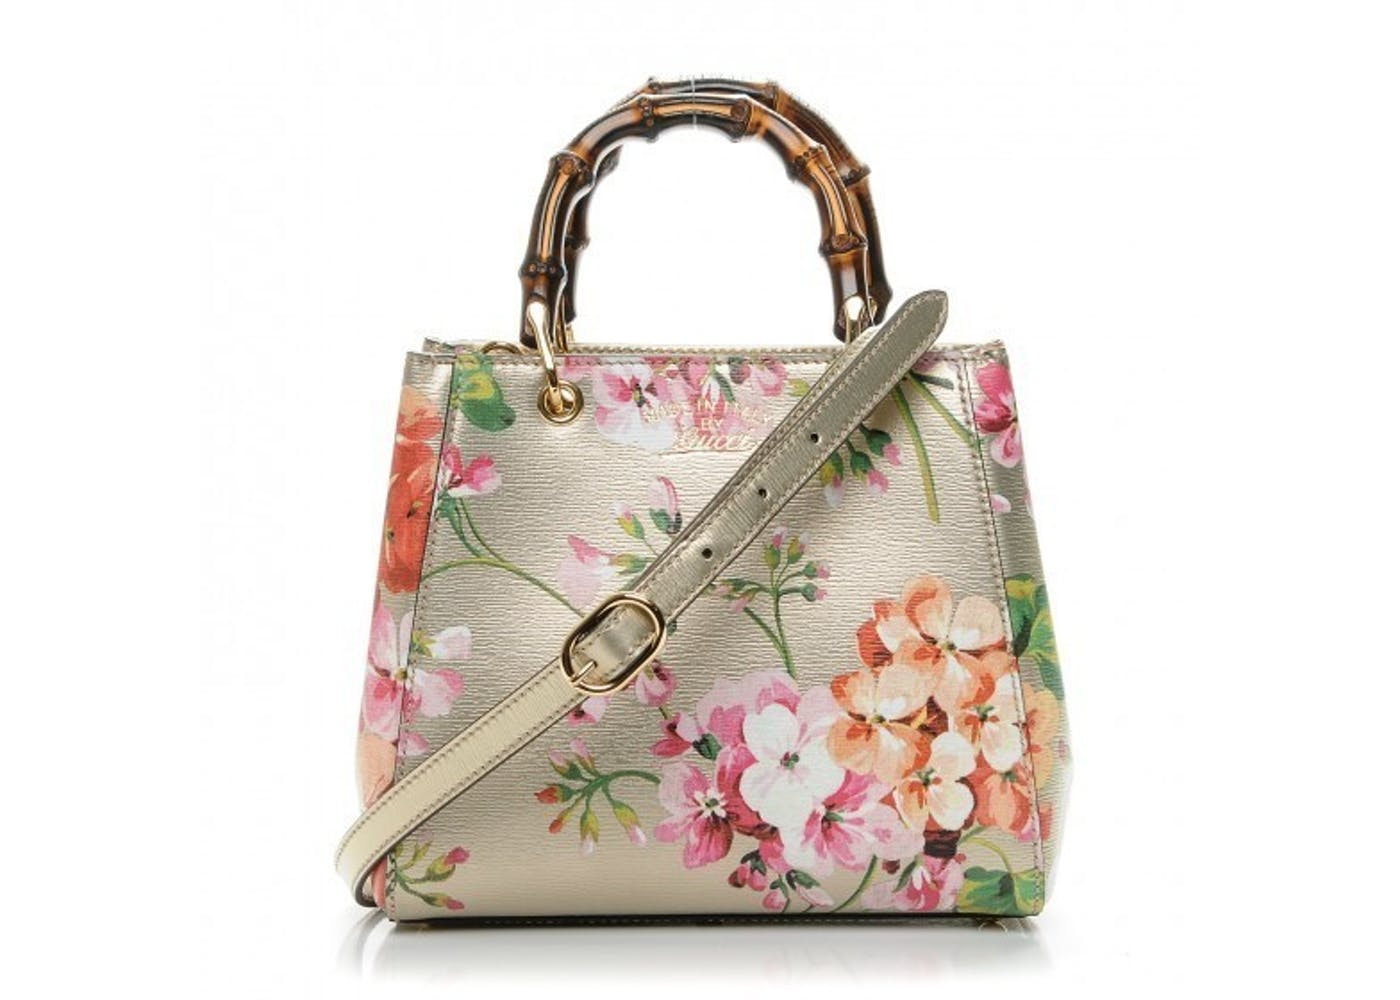 c3a78c1eefd Gucci Bamboo Shopper Blooms Print Tote Flora Mini Gold